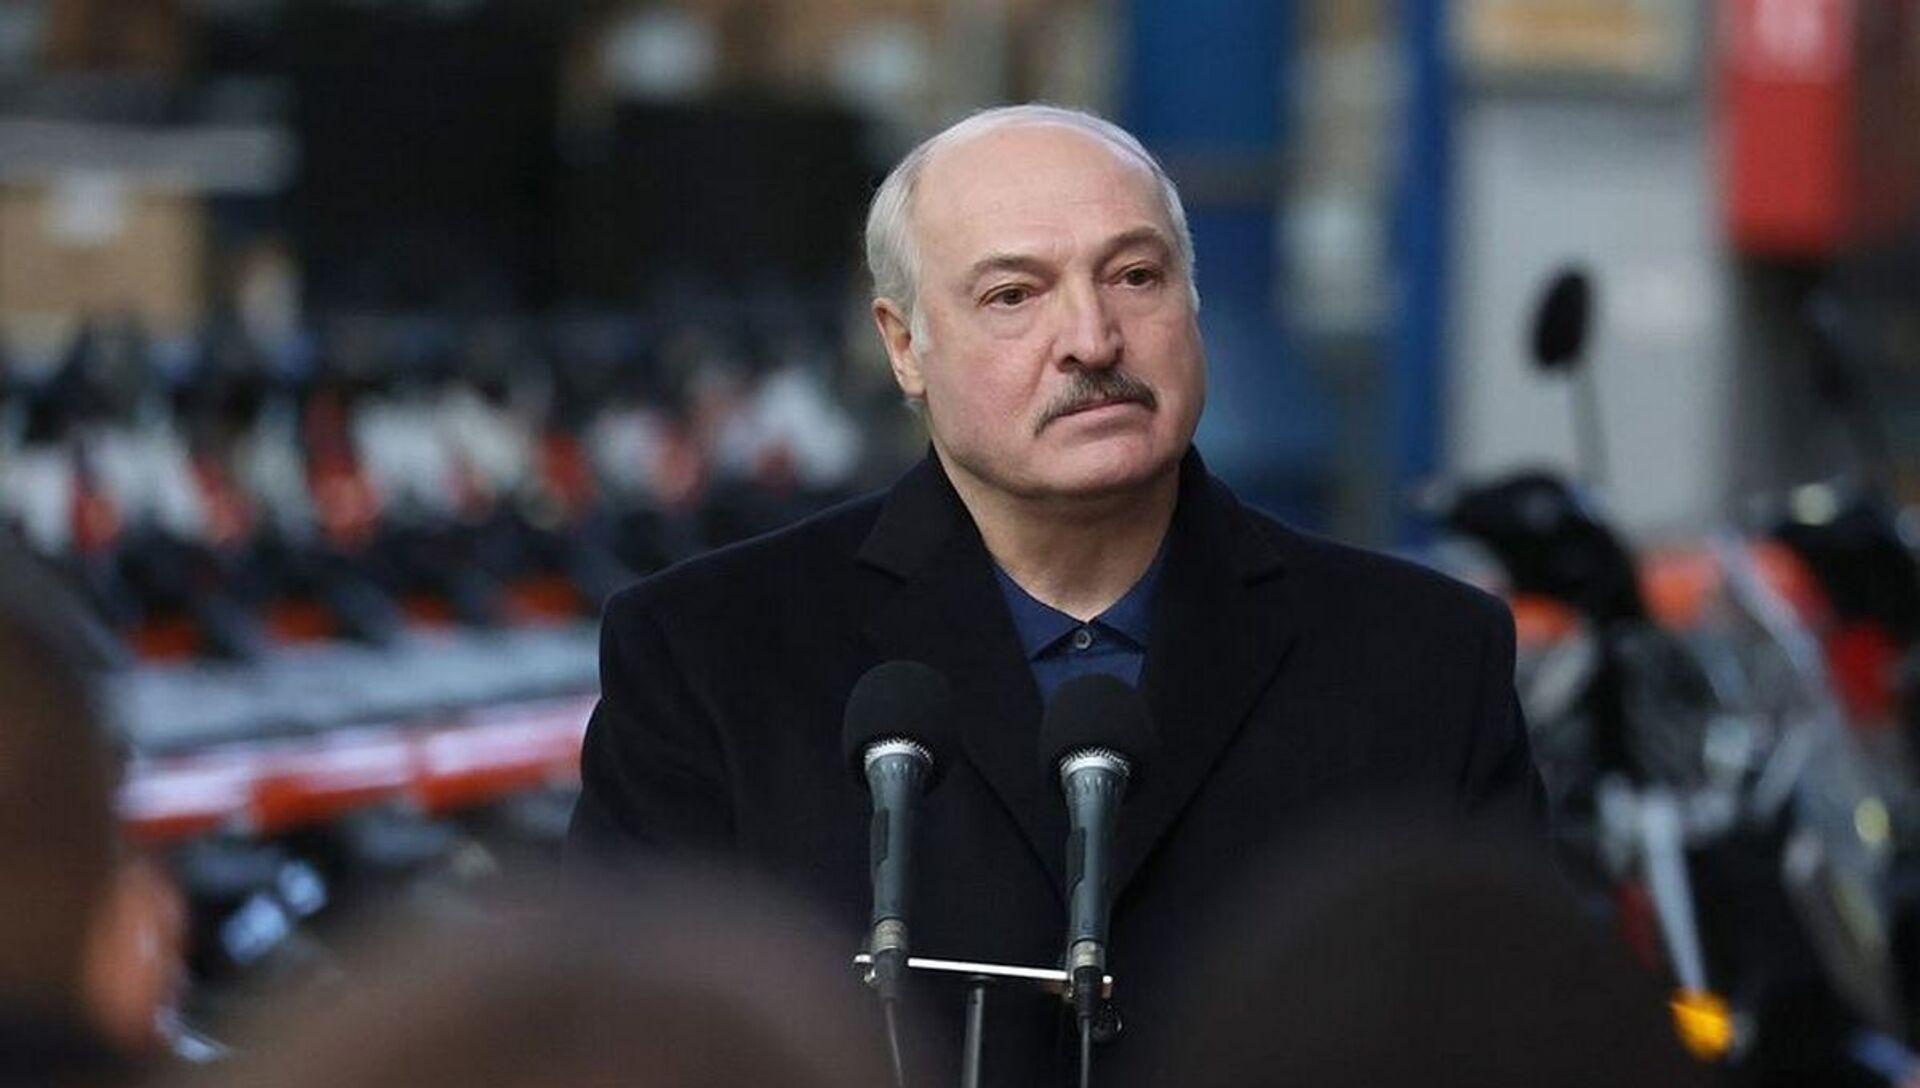 Посещение президентом Беларуси Александром Лукашенко ОАО Мотовело  - Sputnik Беларусь, 1920, 05.03.2021